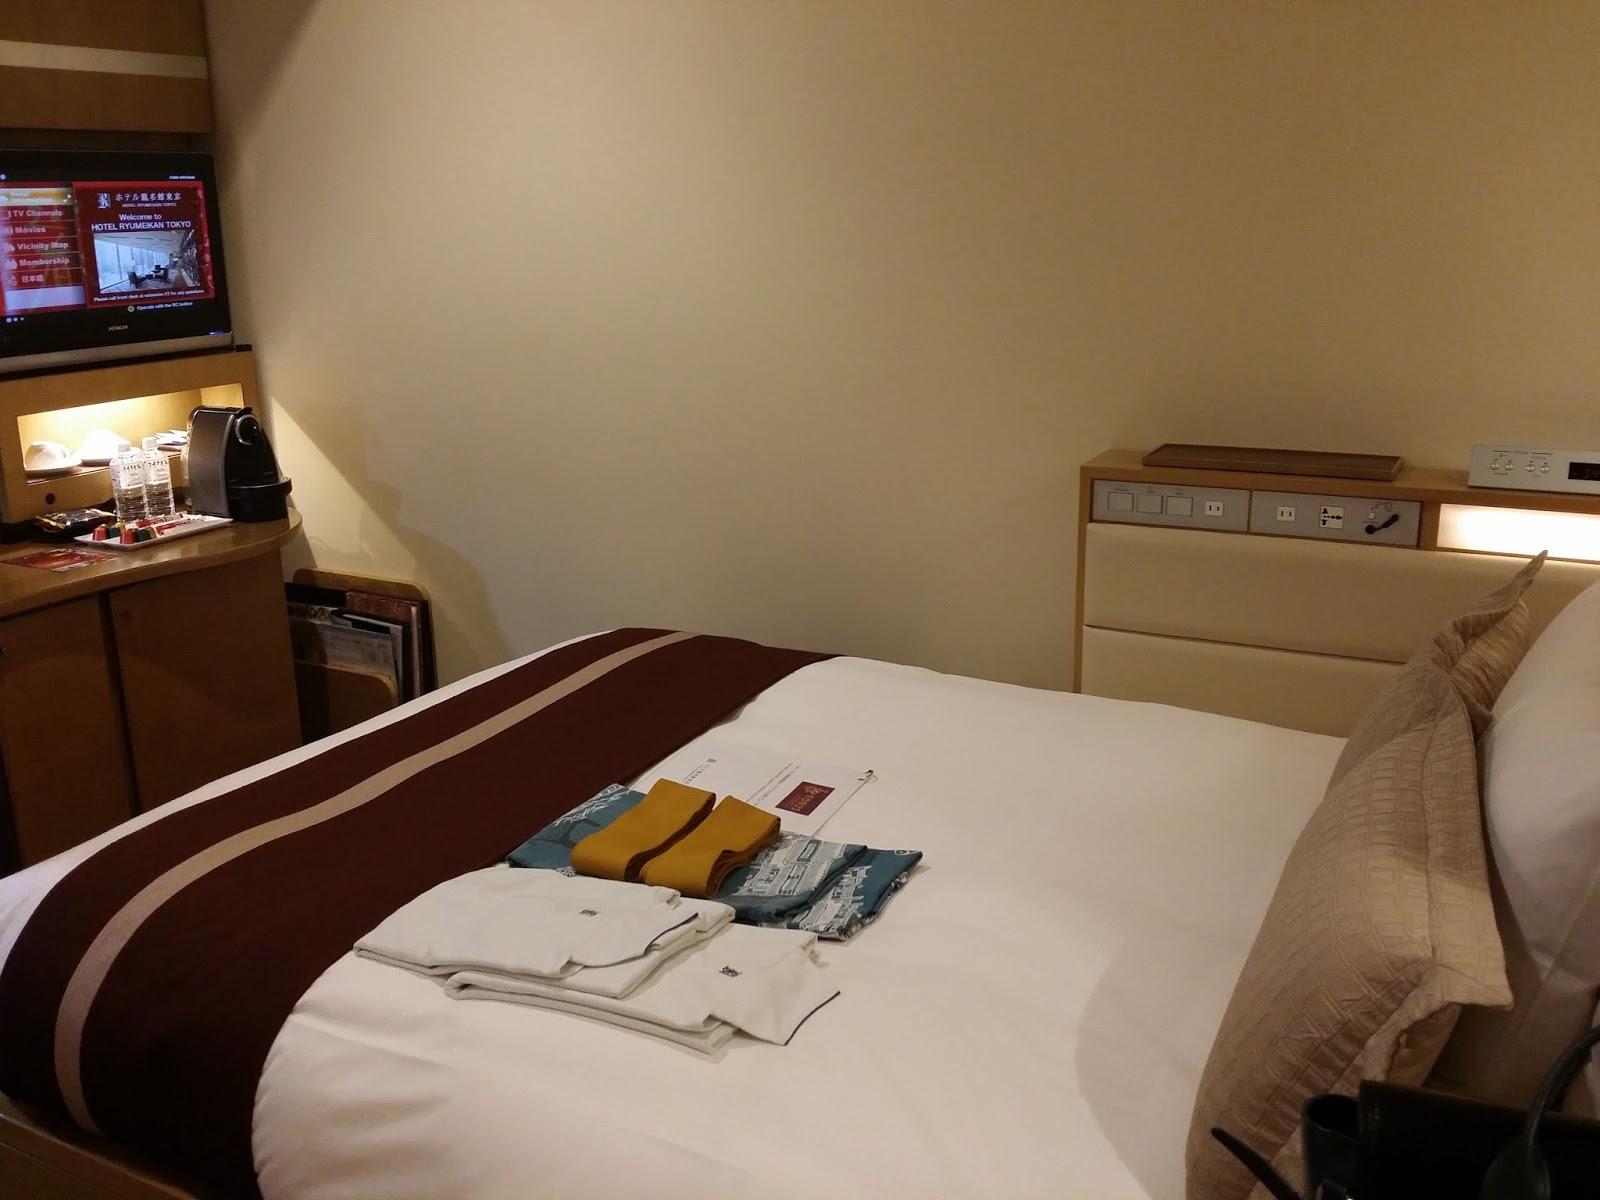 Hotel Ryumeikan Tokyo Eat Play Buy And Blog Day 1 In Tokyo Japan 27th December 2014